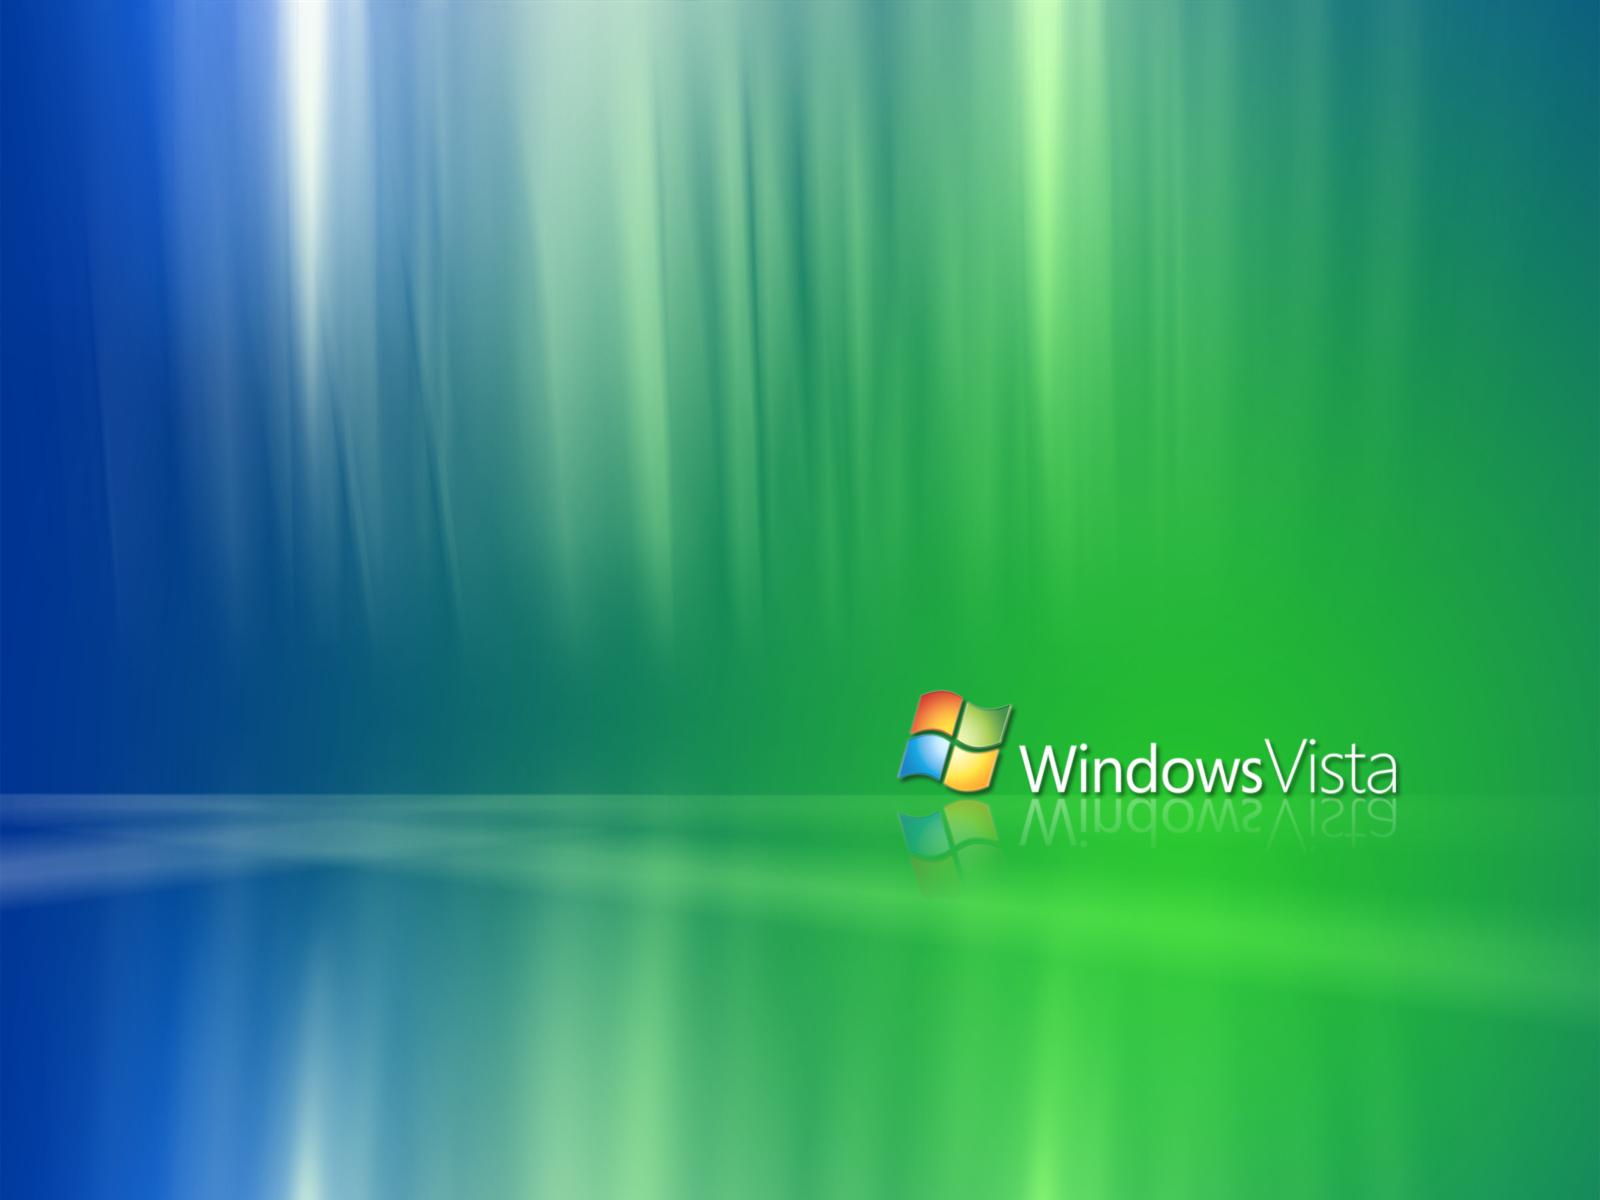 Free Download Wallpapers De Windows Vista Taringa 1600x1200